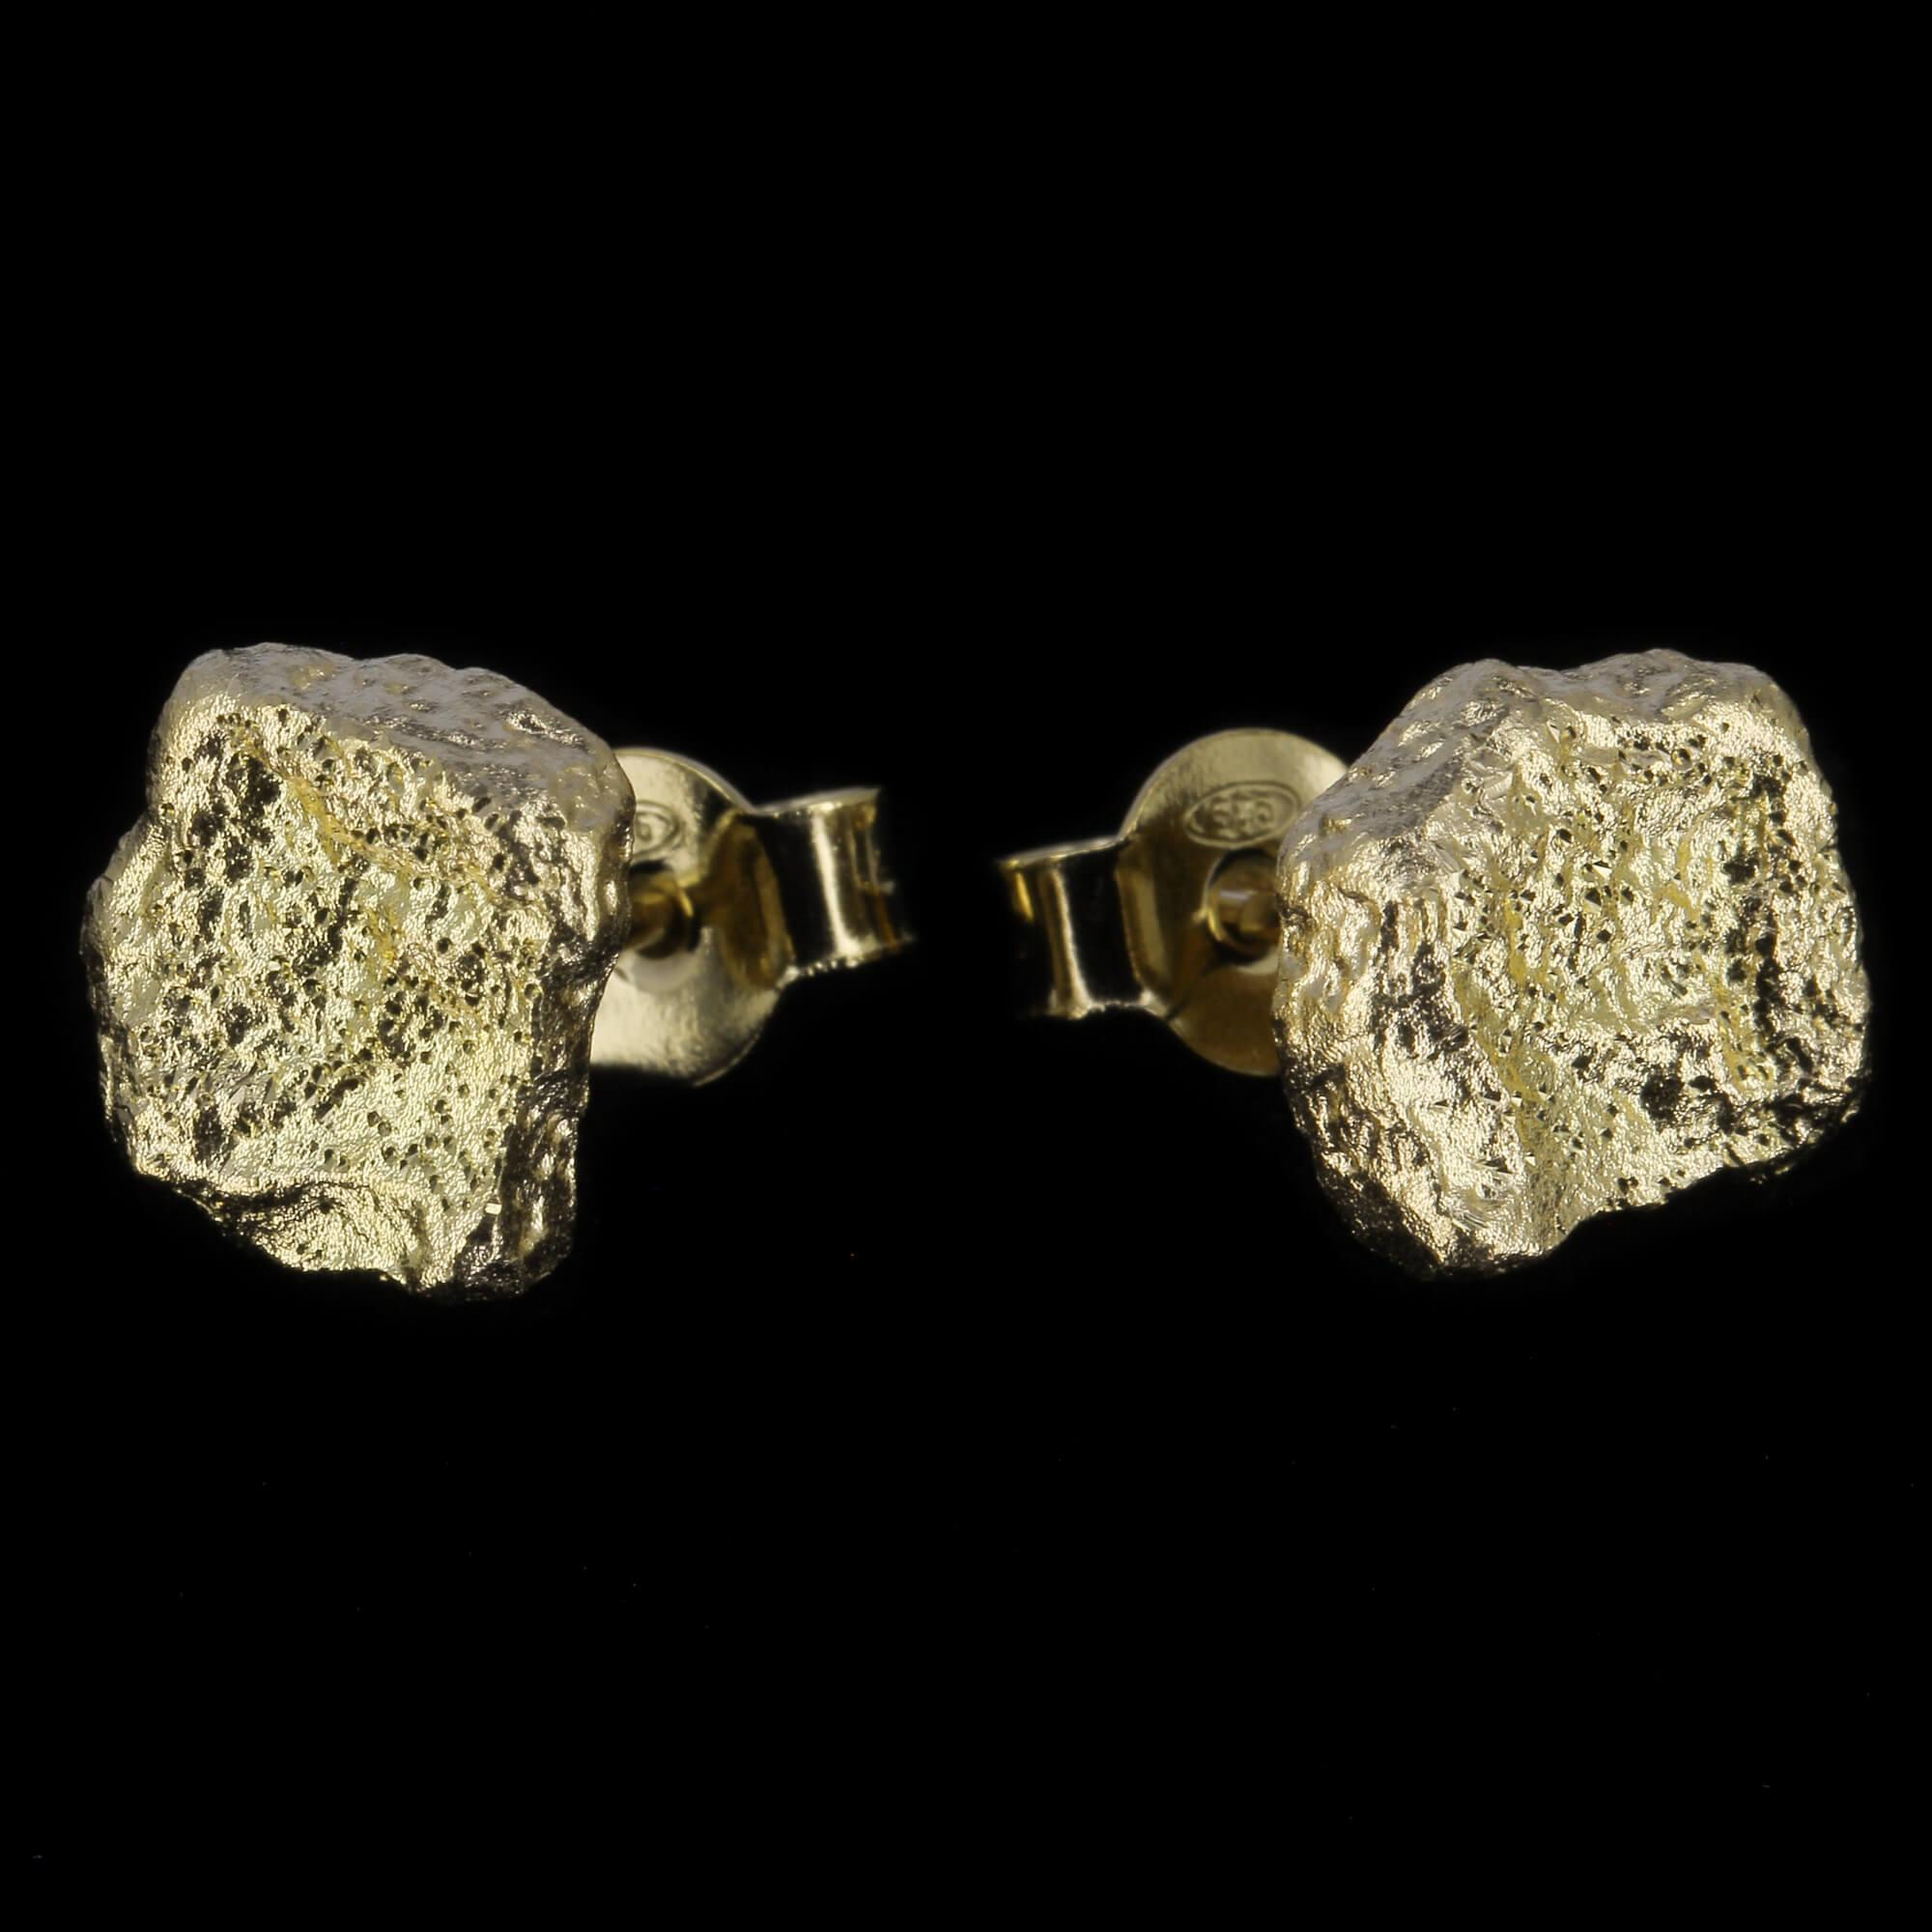 Kleine vergulde steenvormige oorbellen